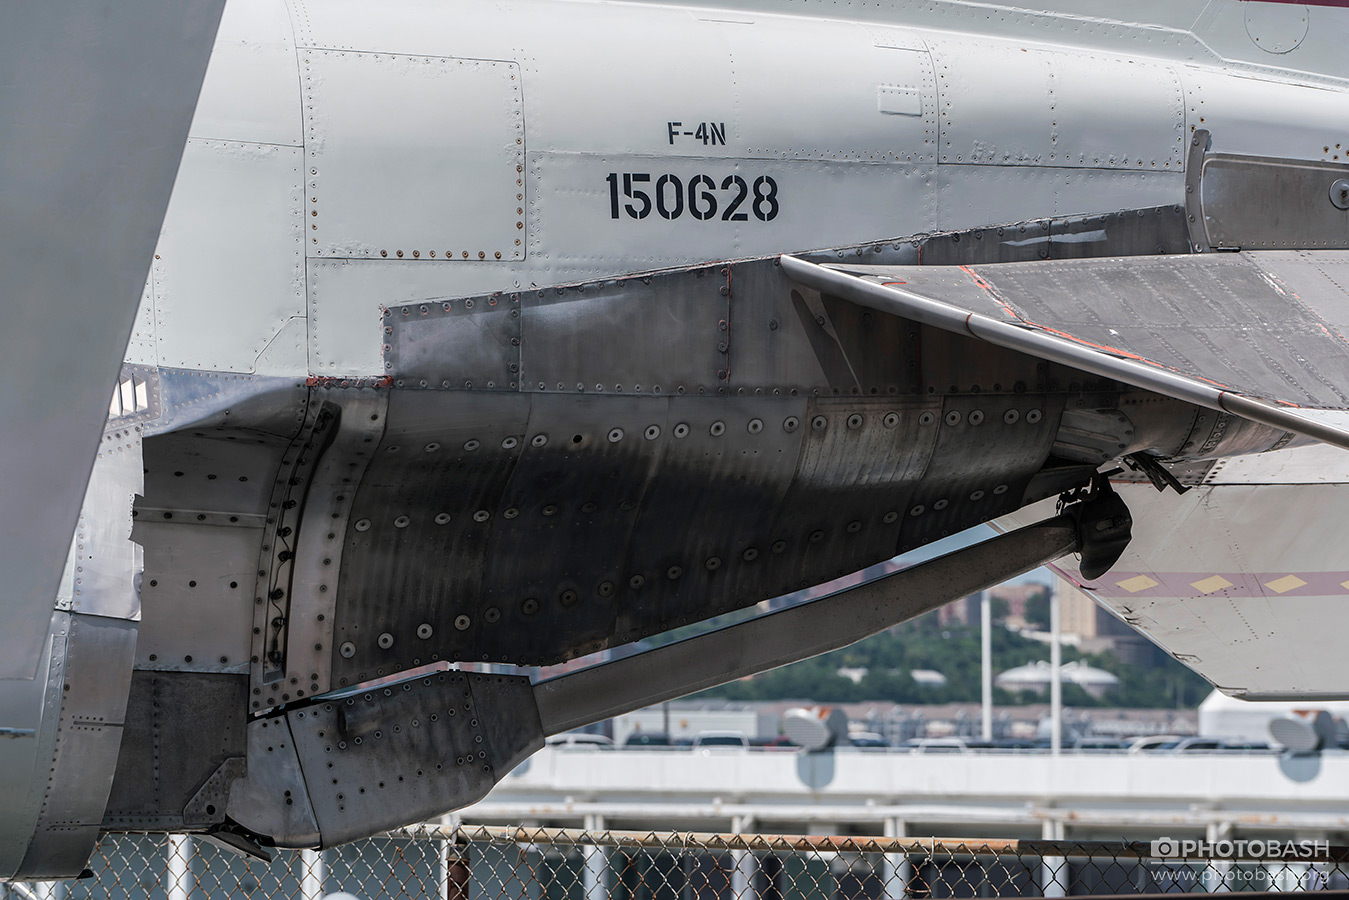 American-Jet-Fighter-Aircraft-Plates.jpg